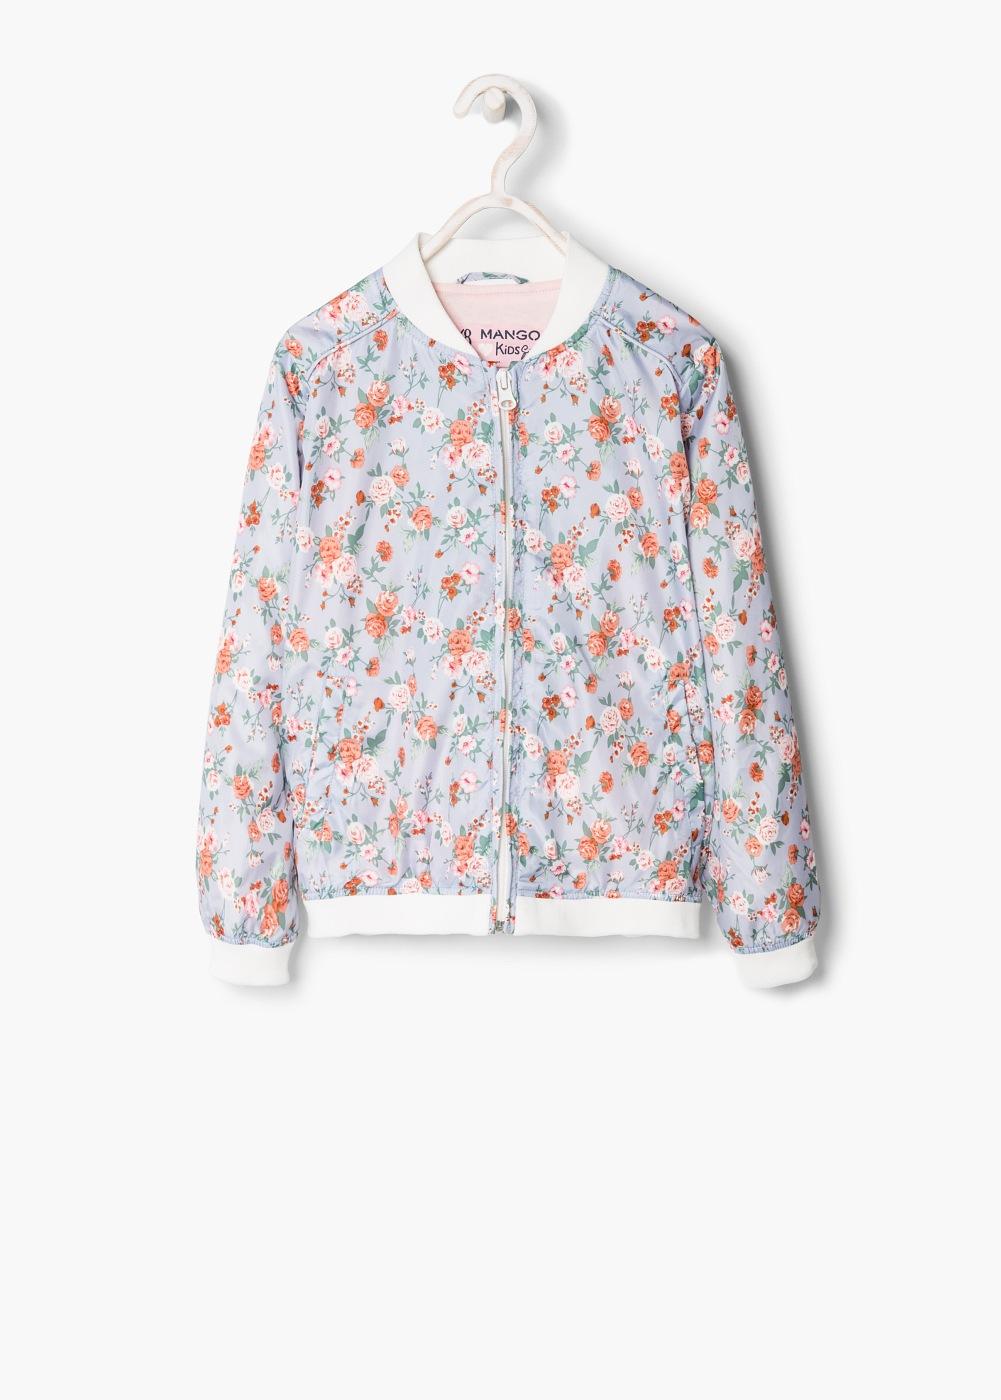 veste fleurie 24,99€